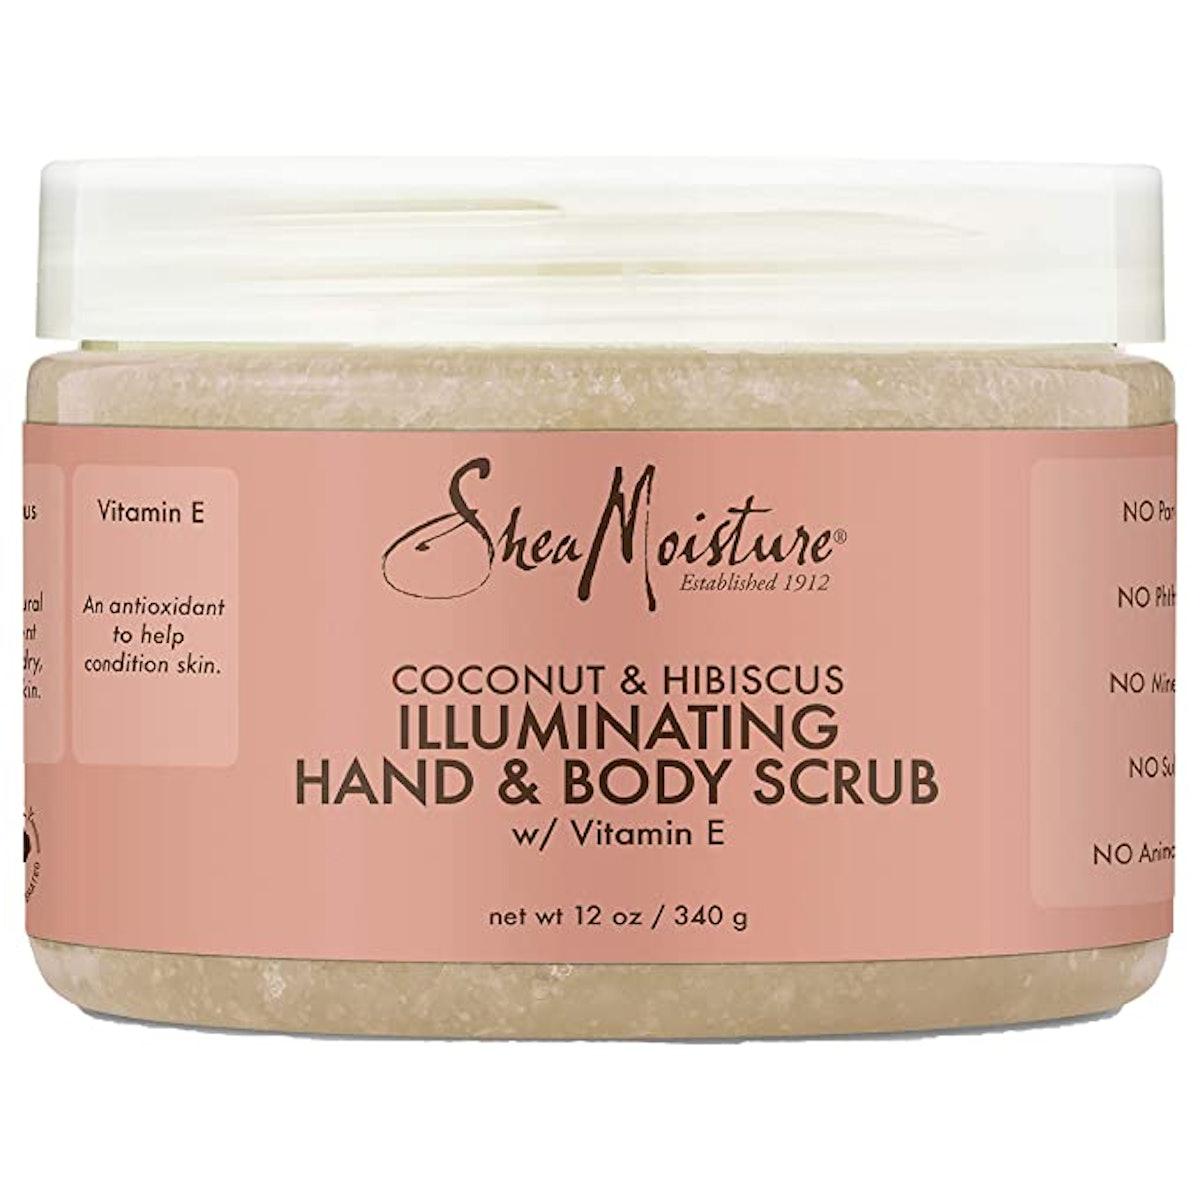 SheaMoisture Illuminating Hand and Body Scrub